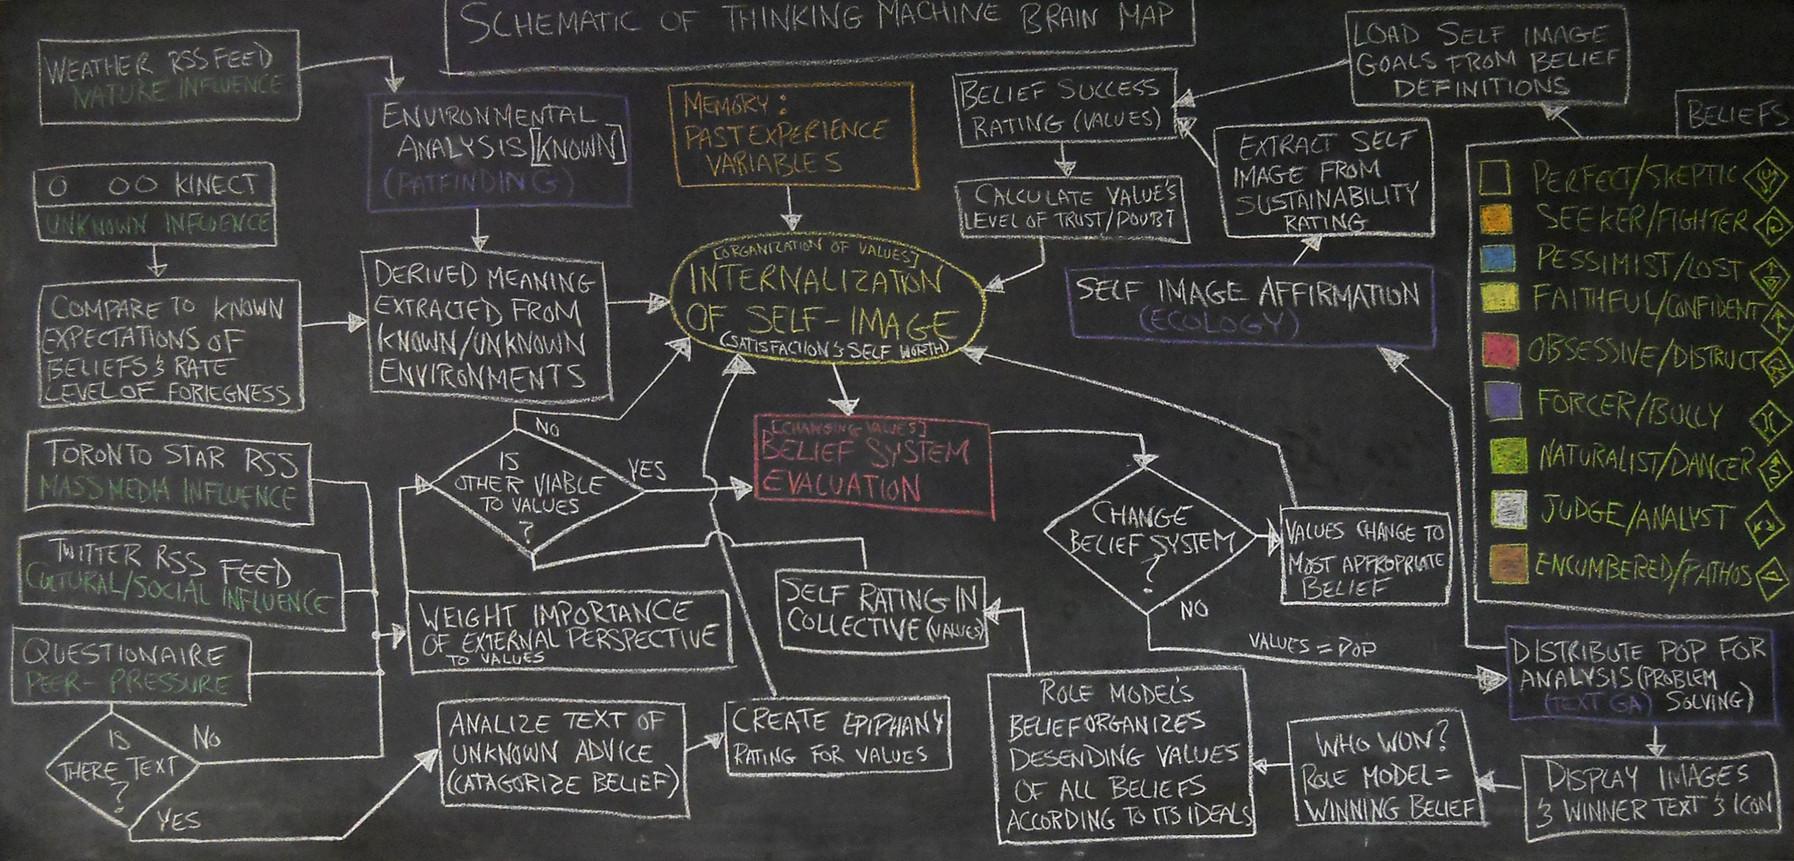 Schematic of Thinking Machine Brain Map